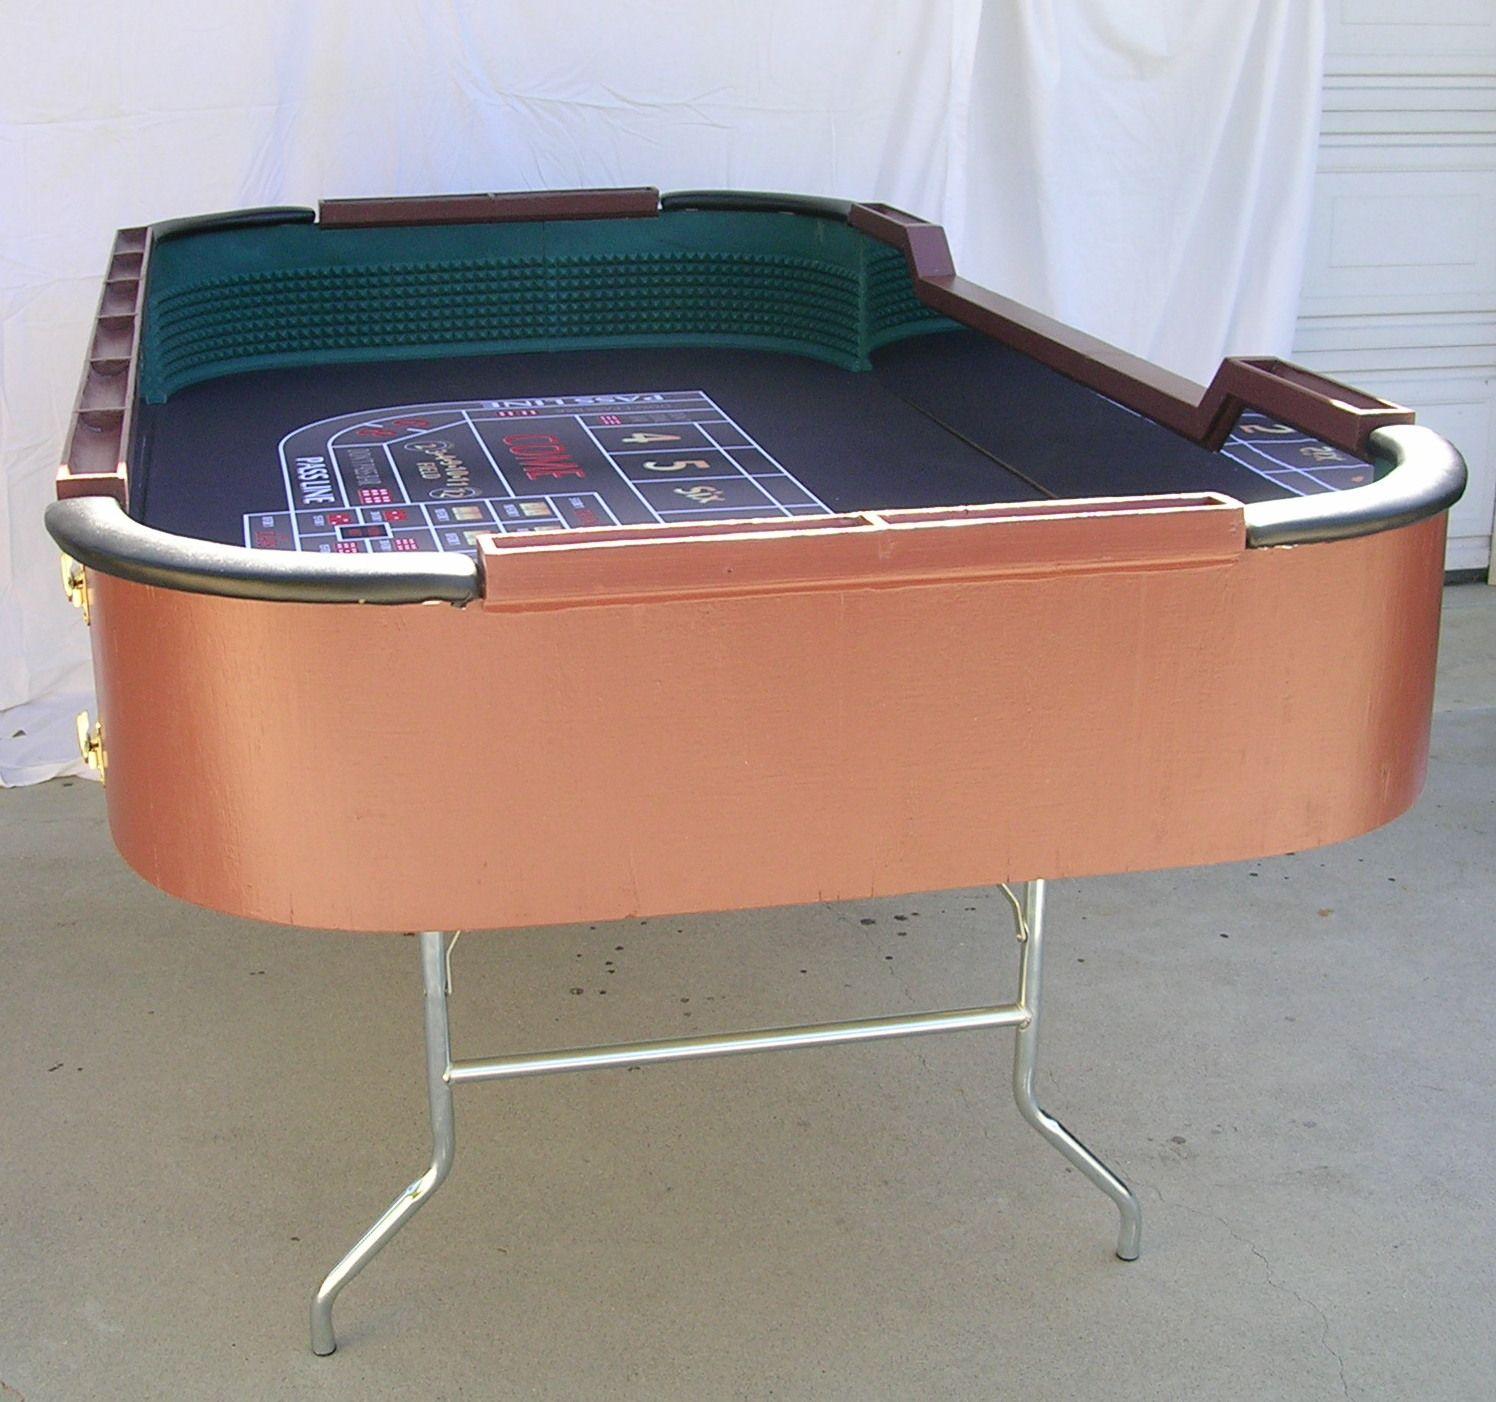 96 Custom Portable Craps Table With Folding Metal Legs